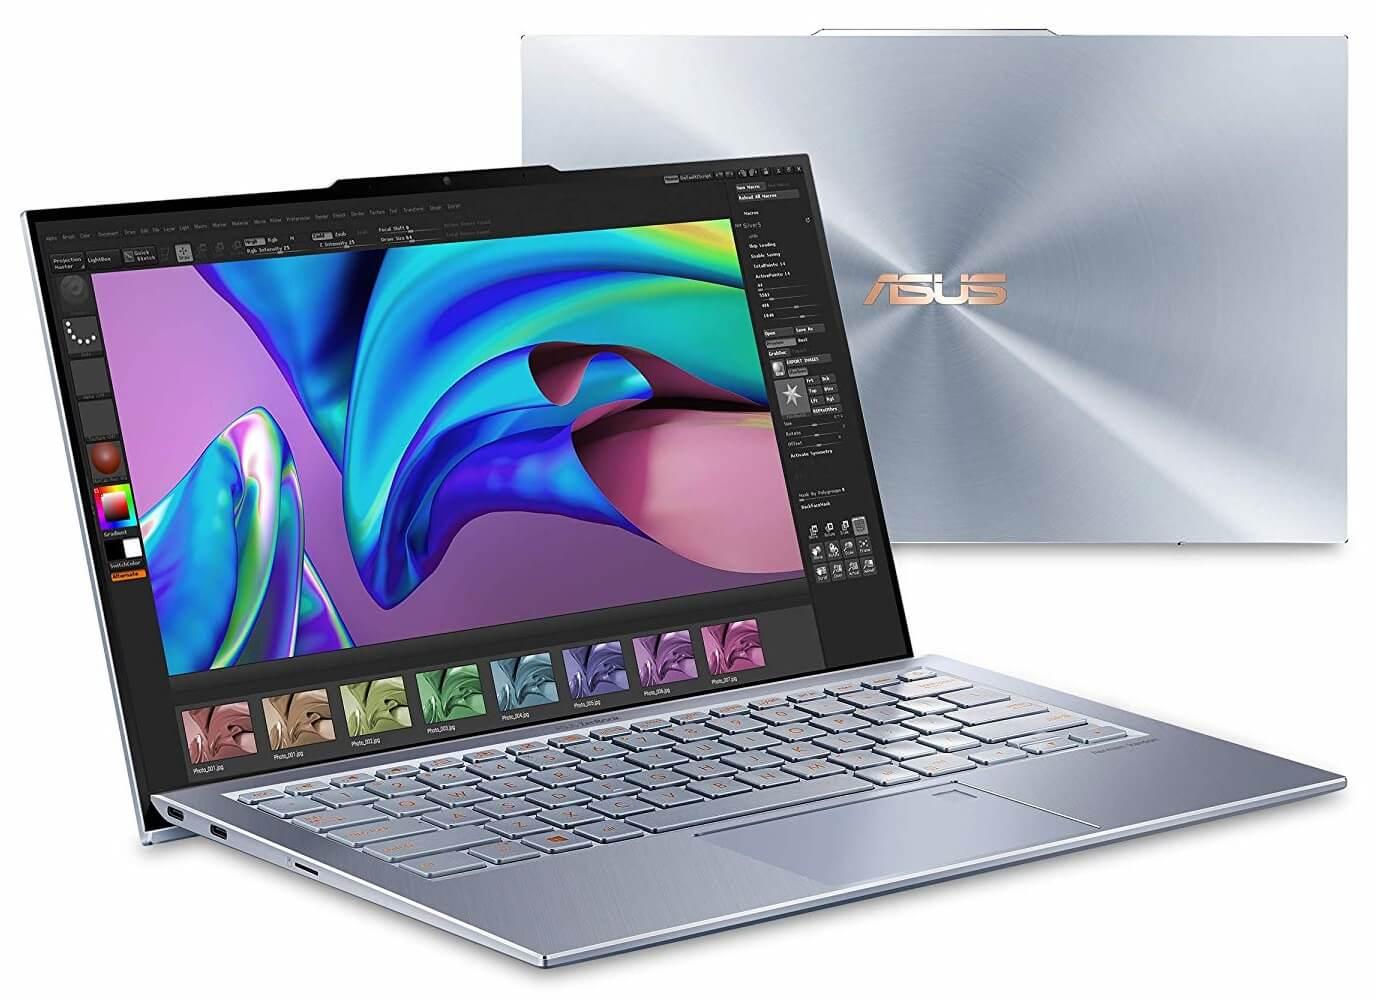 ASUS ZenBook S13 Ultra Thin Laptop